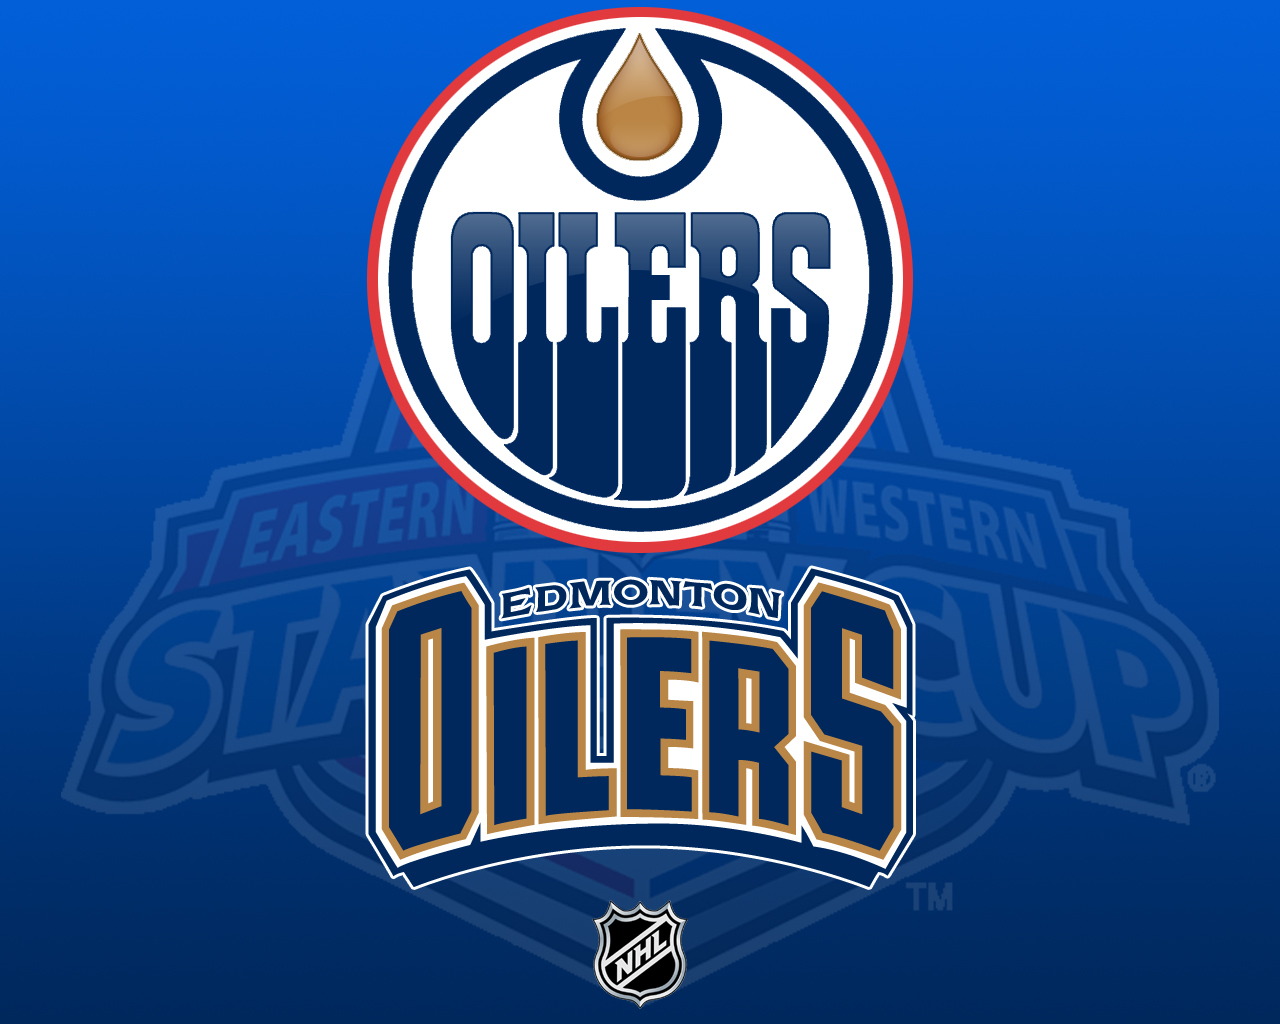 The Official Web Site   Edmonton Oilers 1280x1024